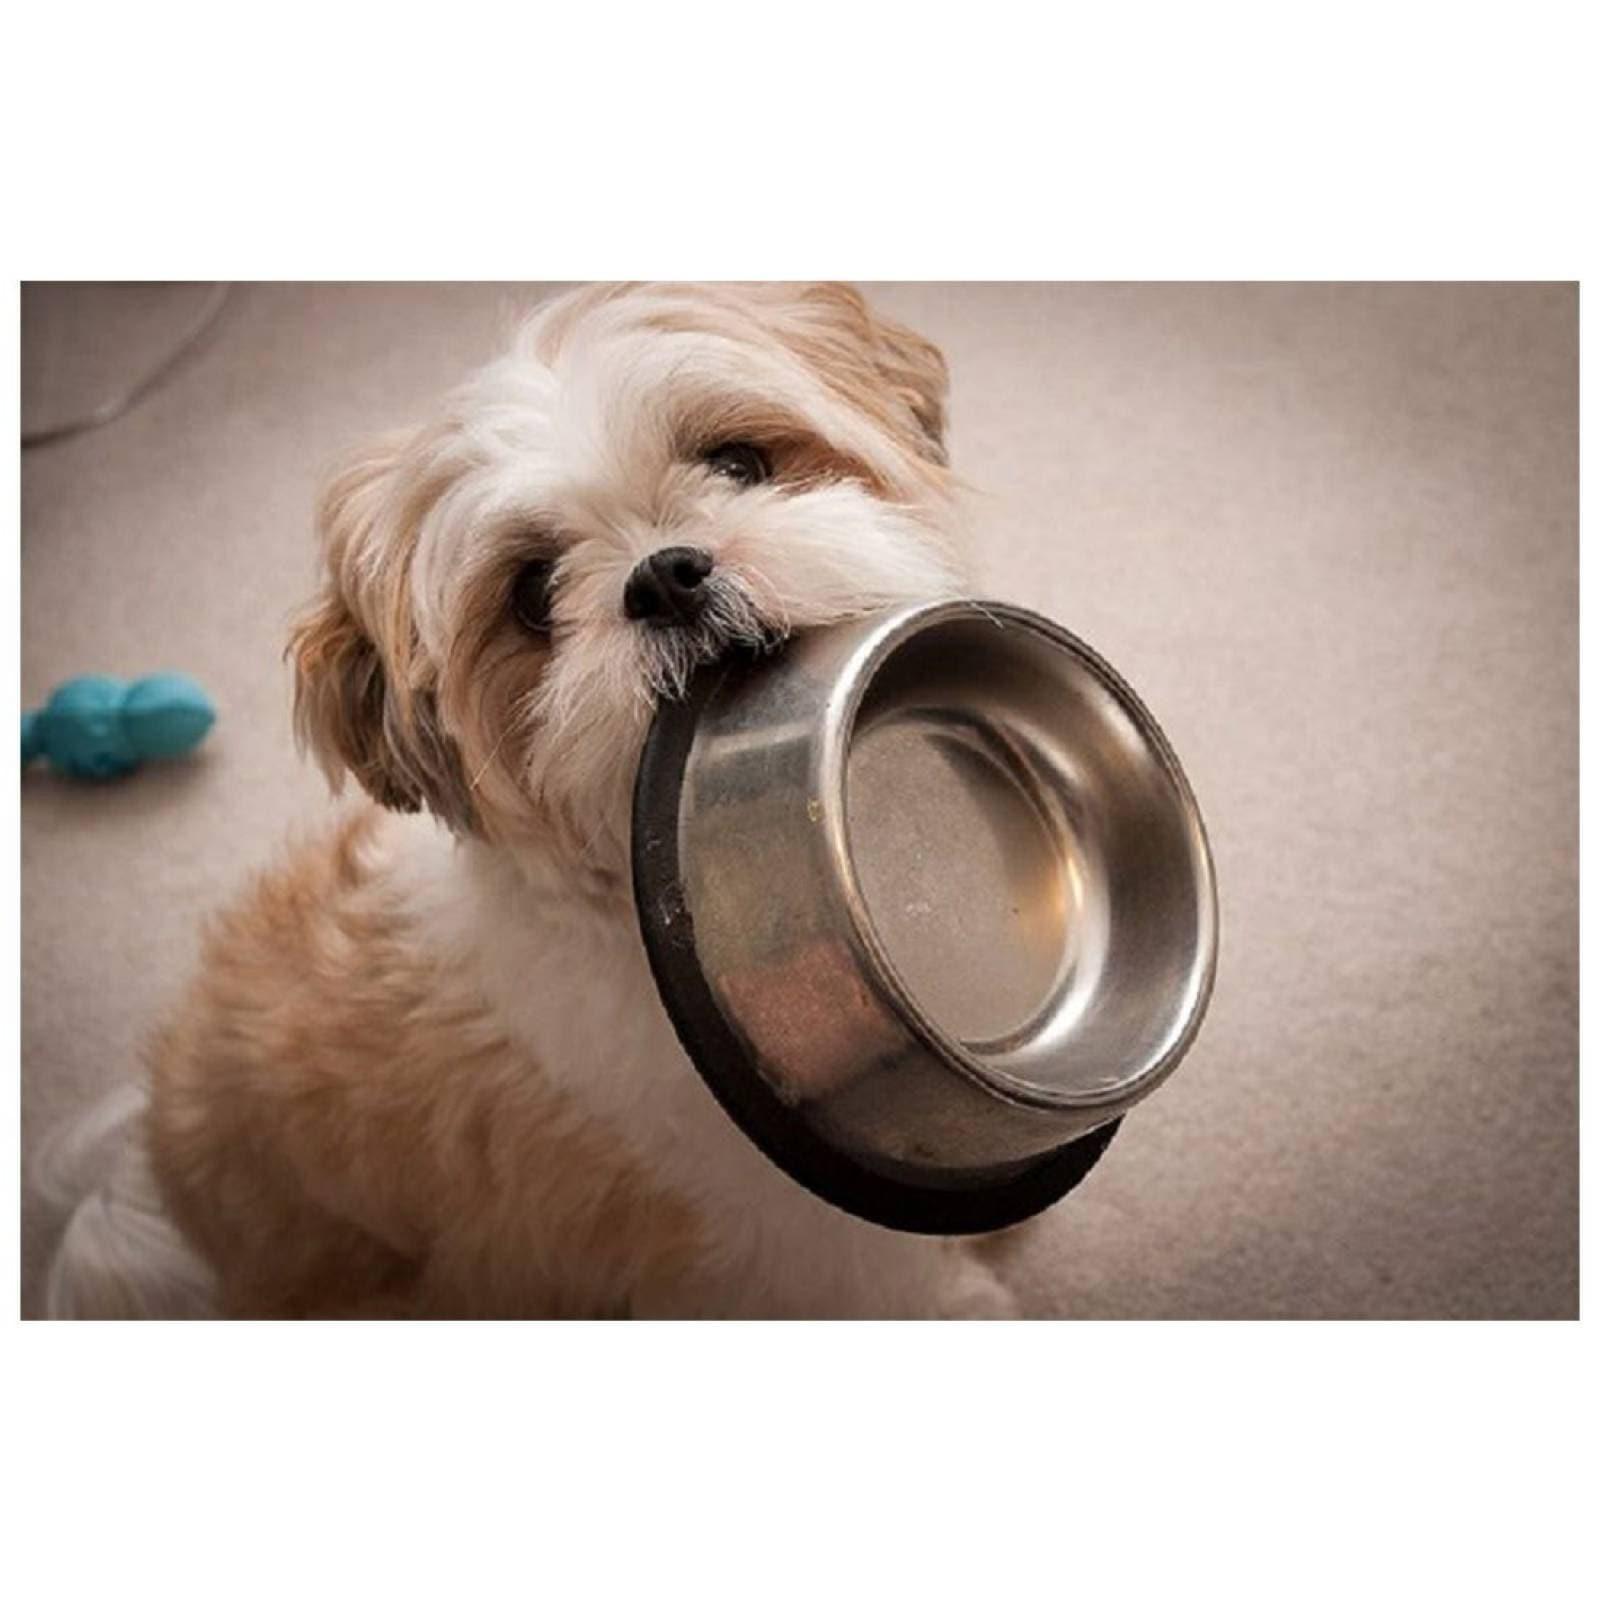 Croquetas Royal Canin 451510 Alimento BHN Shih Tzu 4.54kg